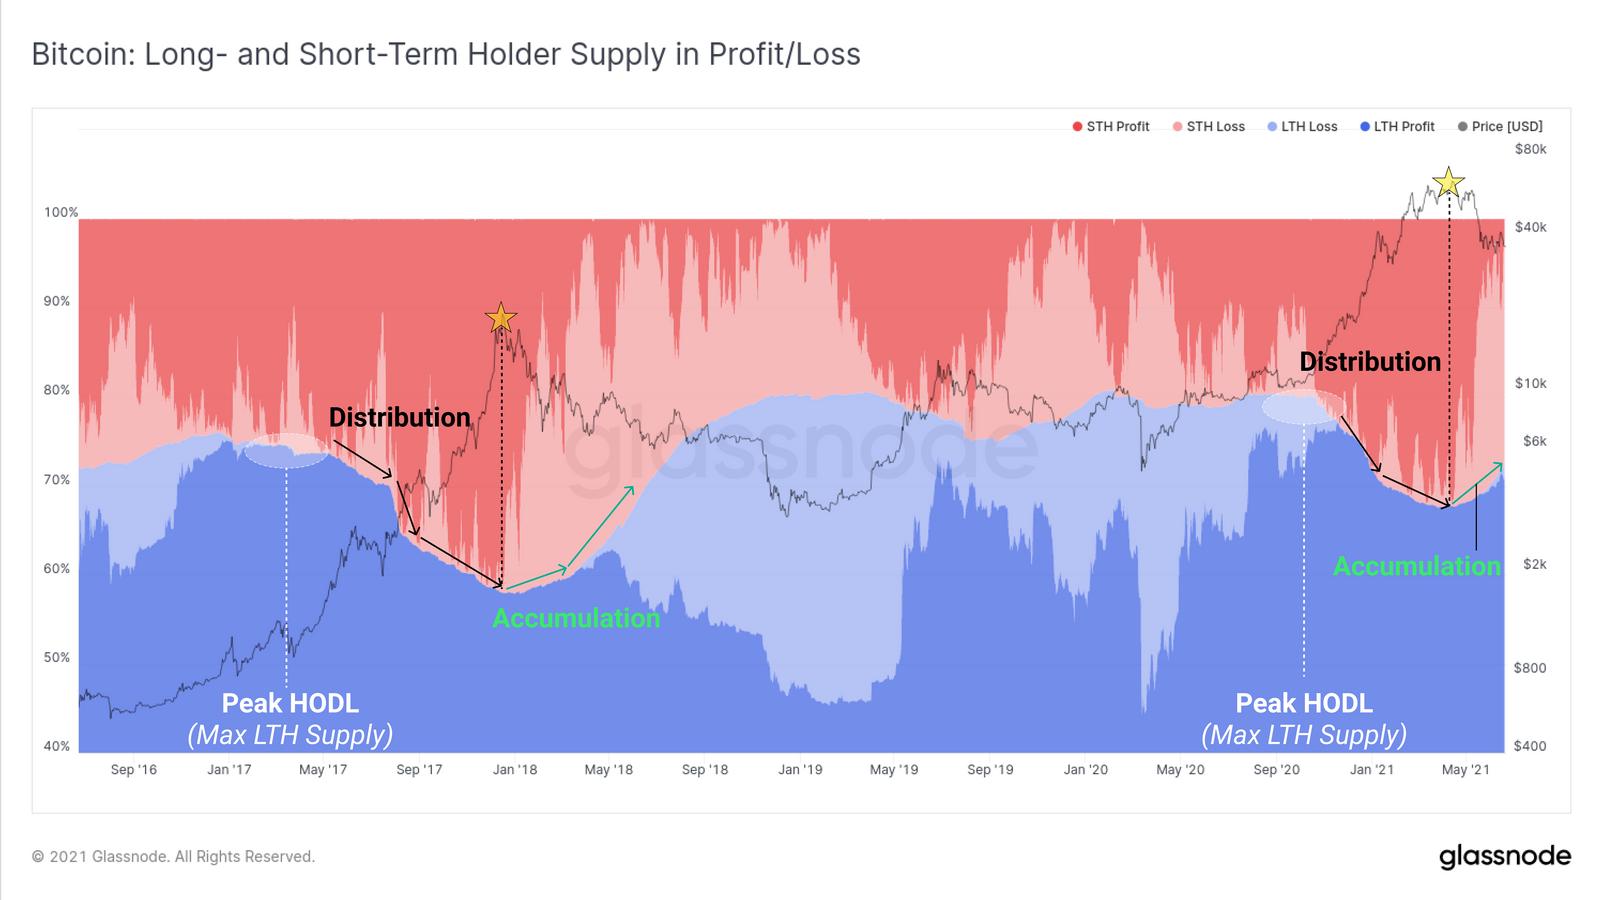 Long-short-term holders supply